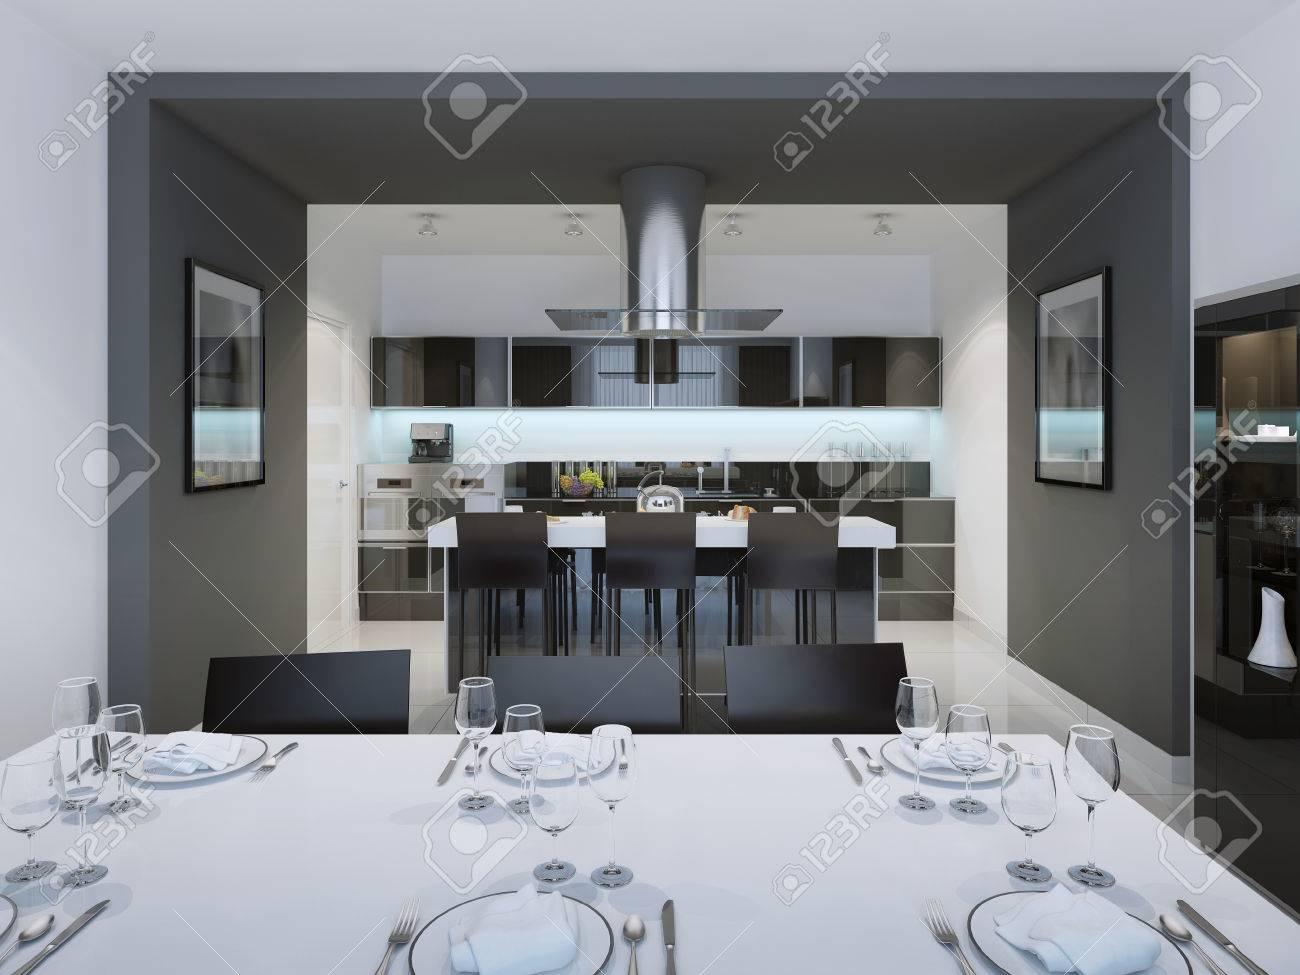 Cuisine De Style Contemporain Avec Une Barre De Ile Separee 3d